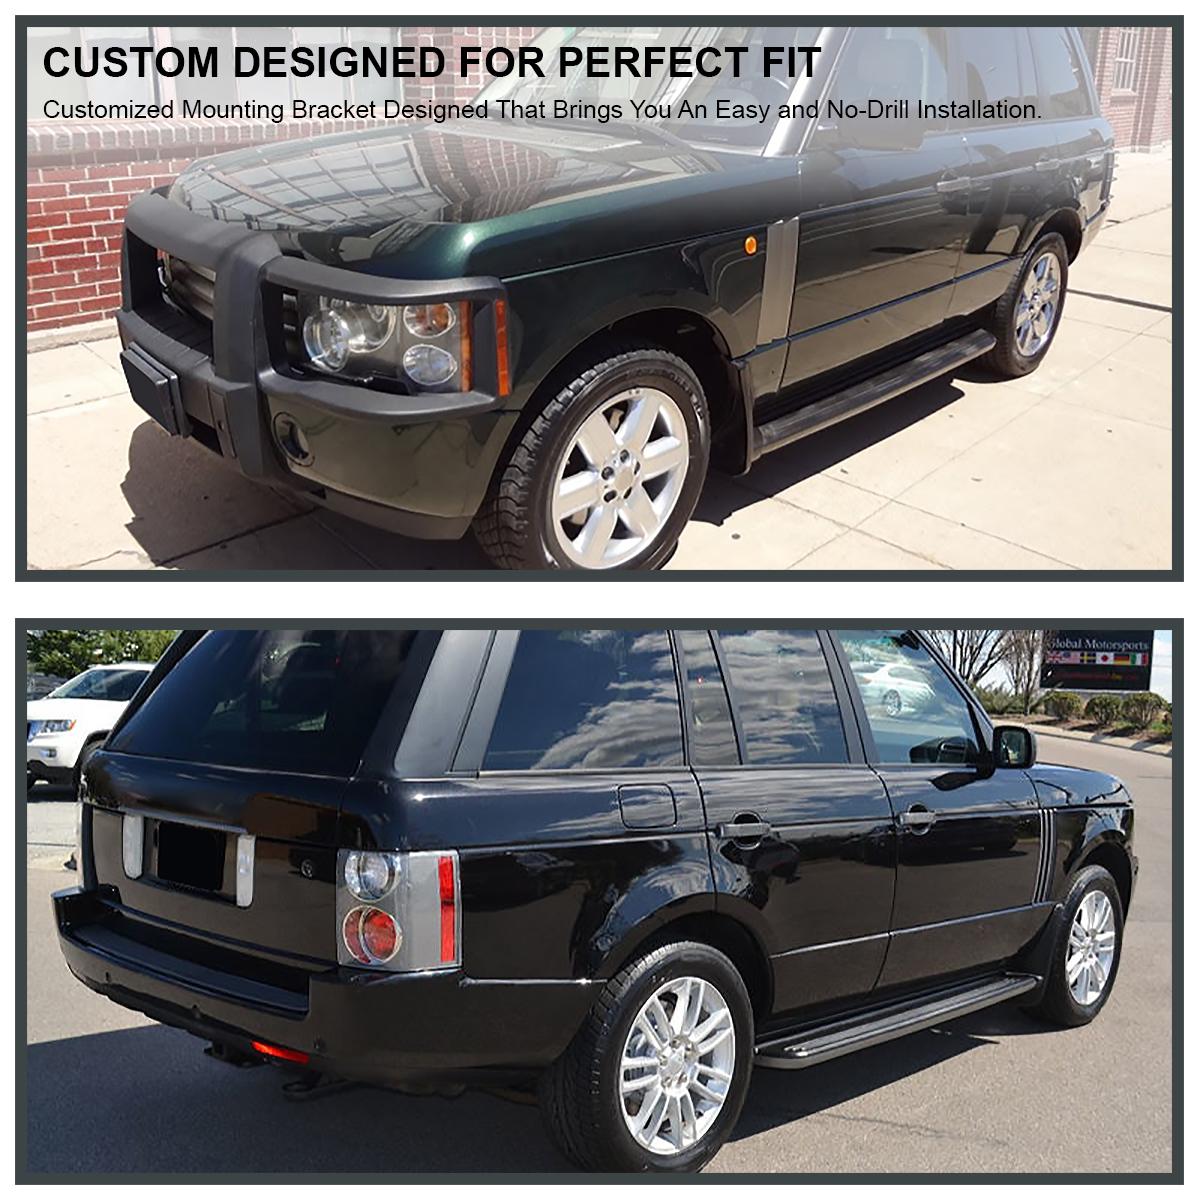 2003-2012 Land Rover Range Rover HSE Sport Aluminum